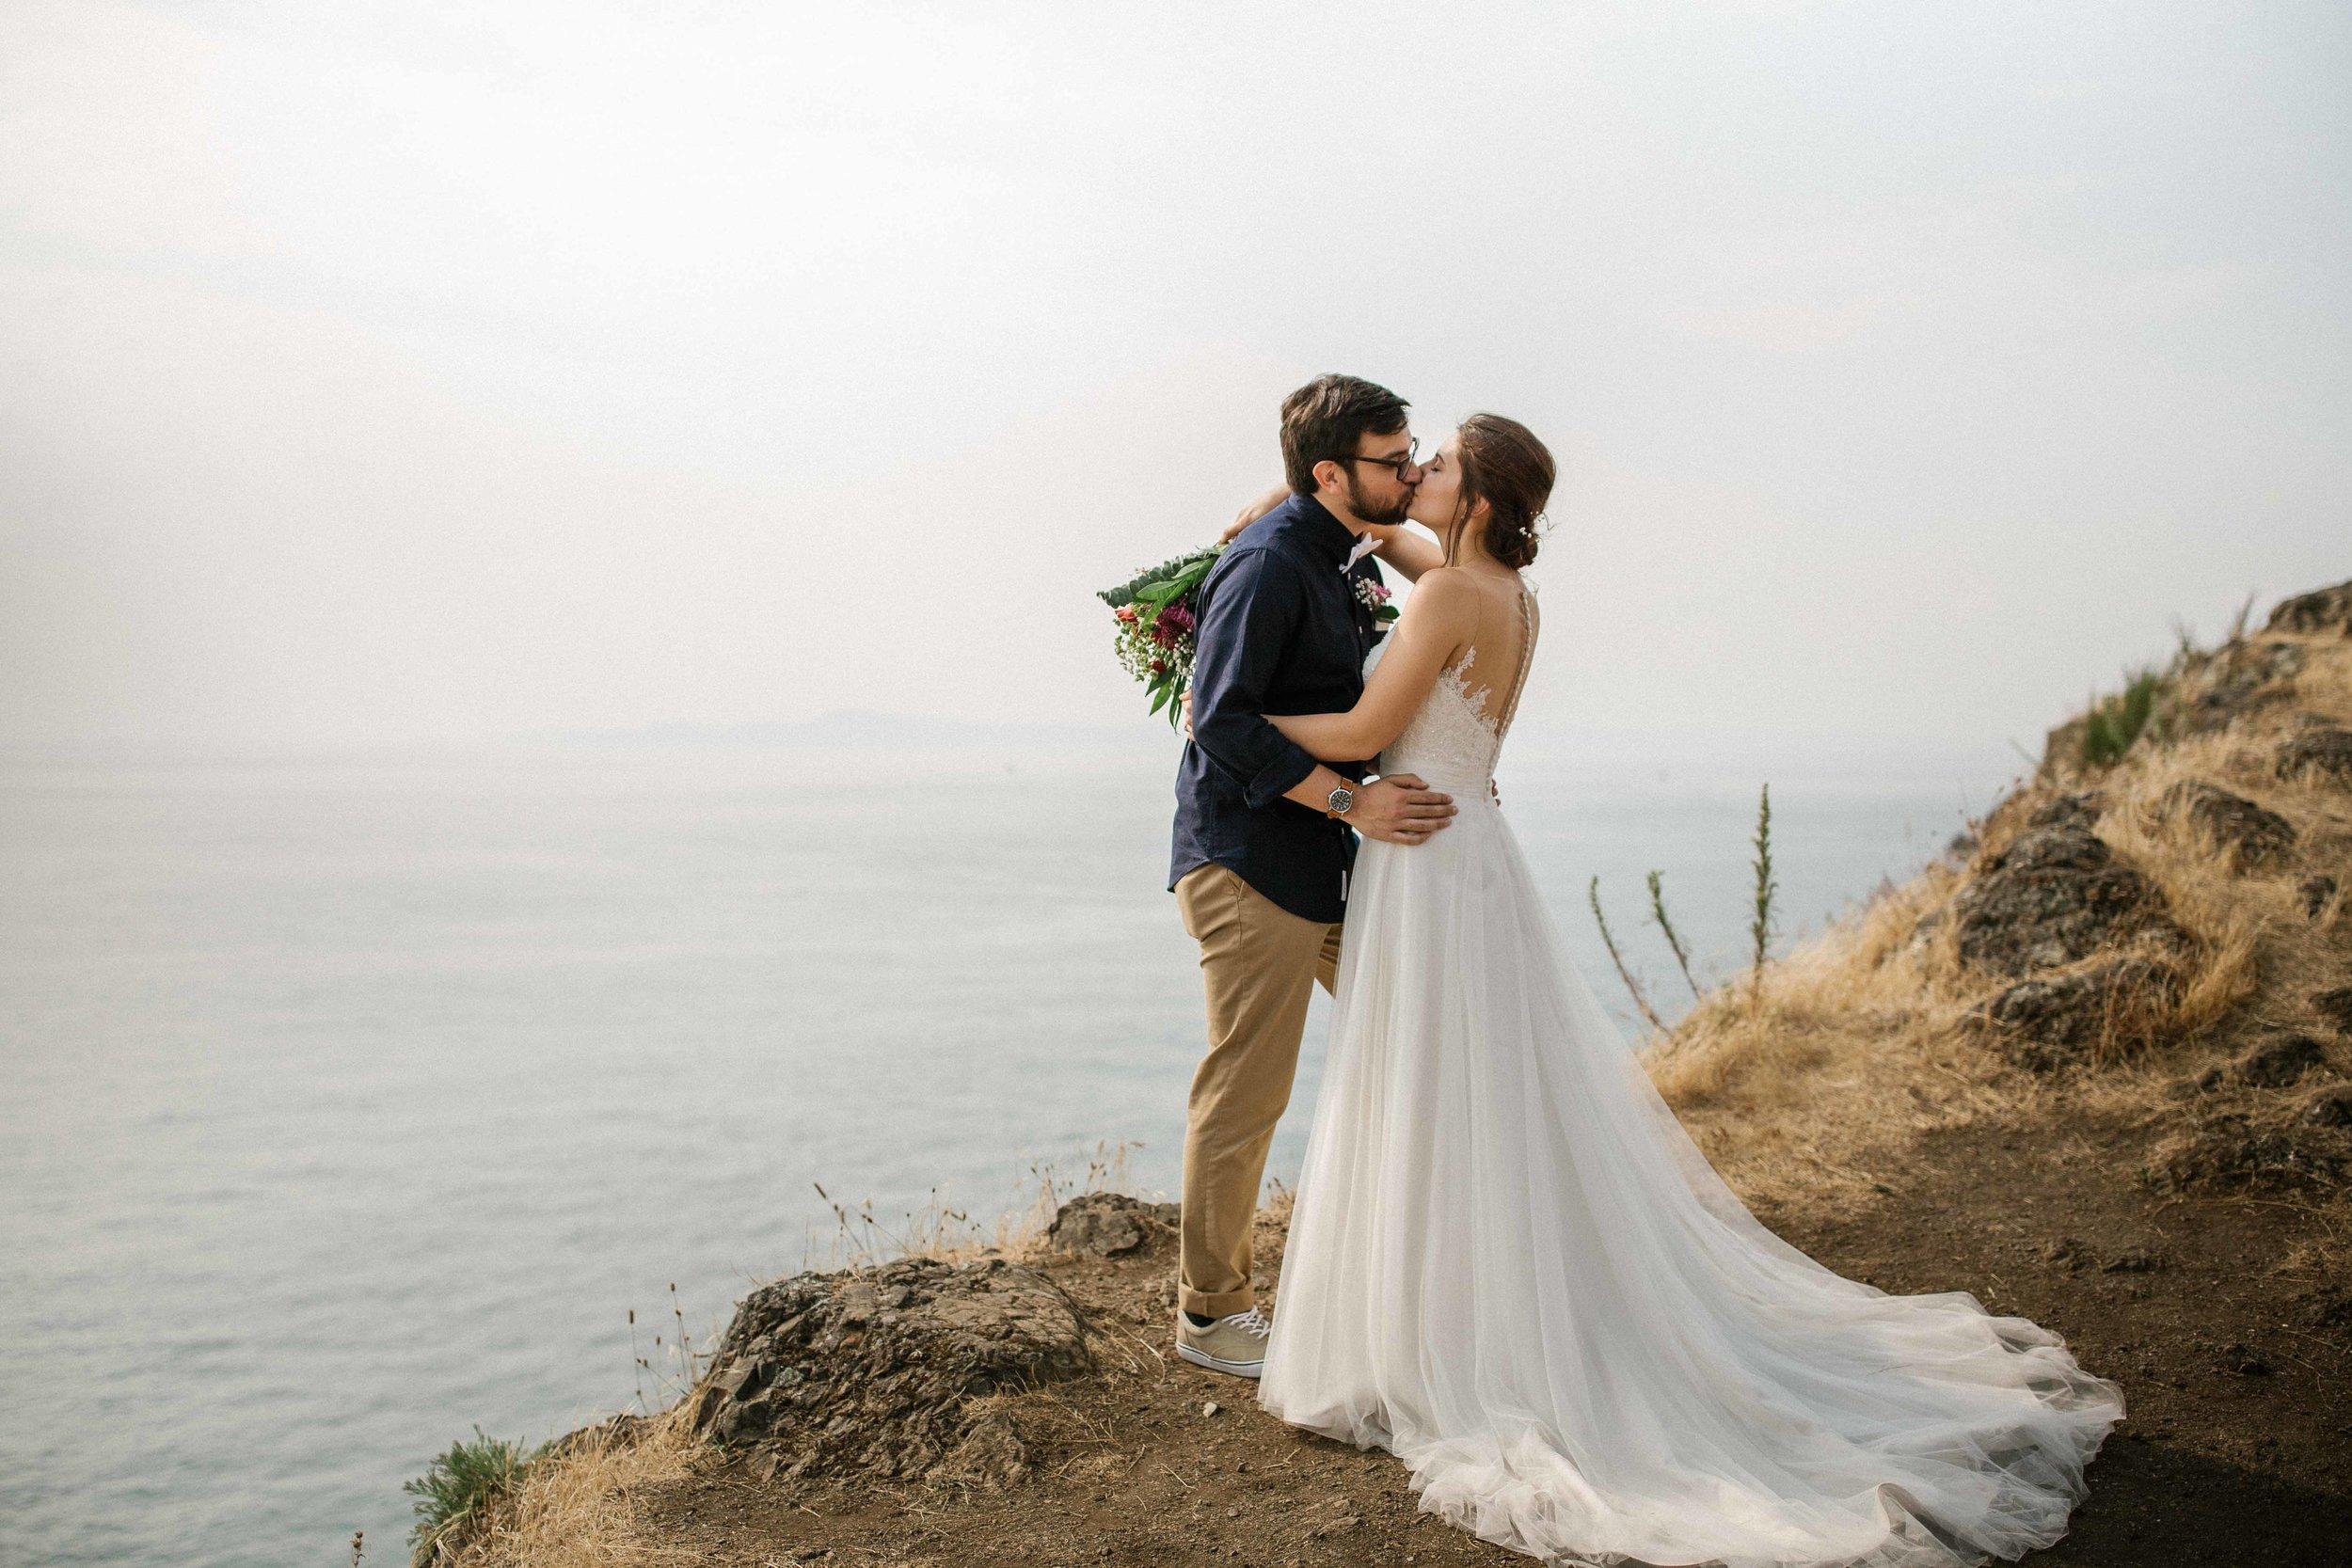 deception-pass-wedding-50.jpg